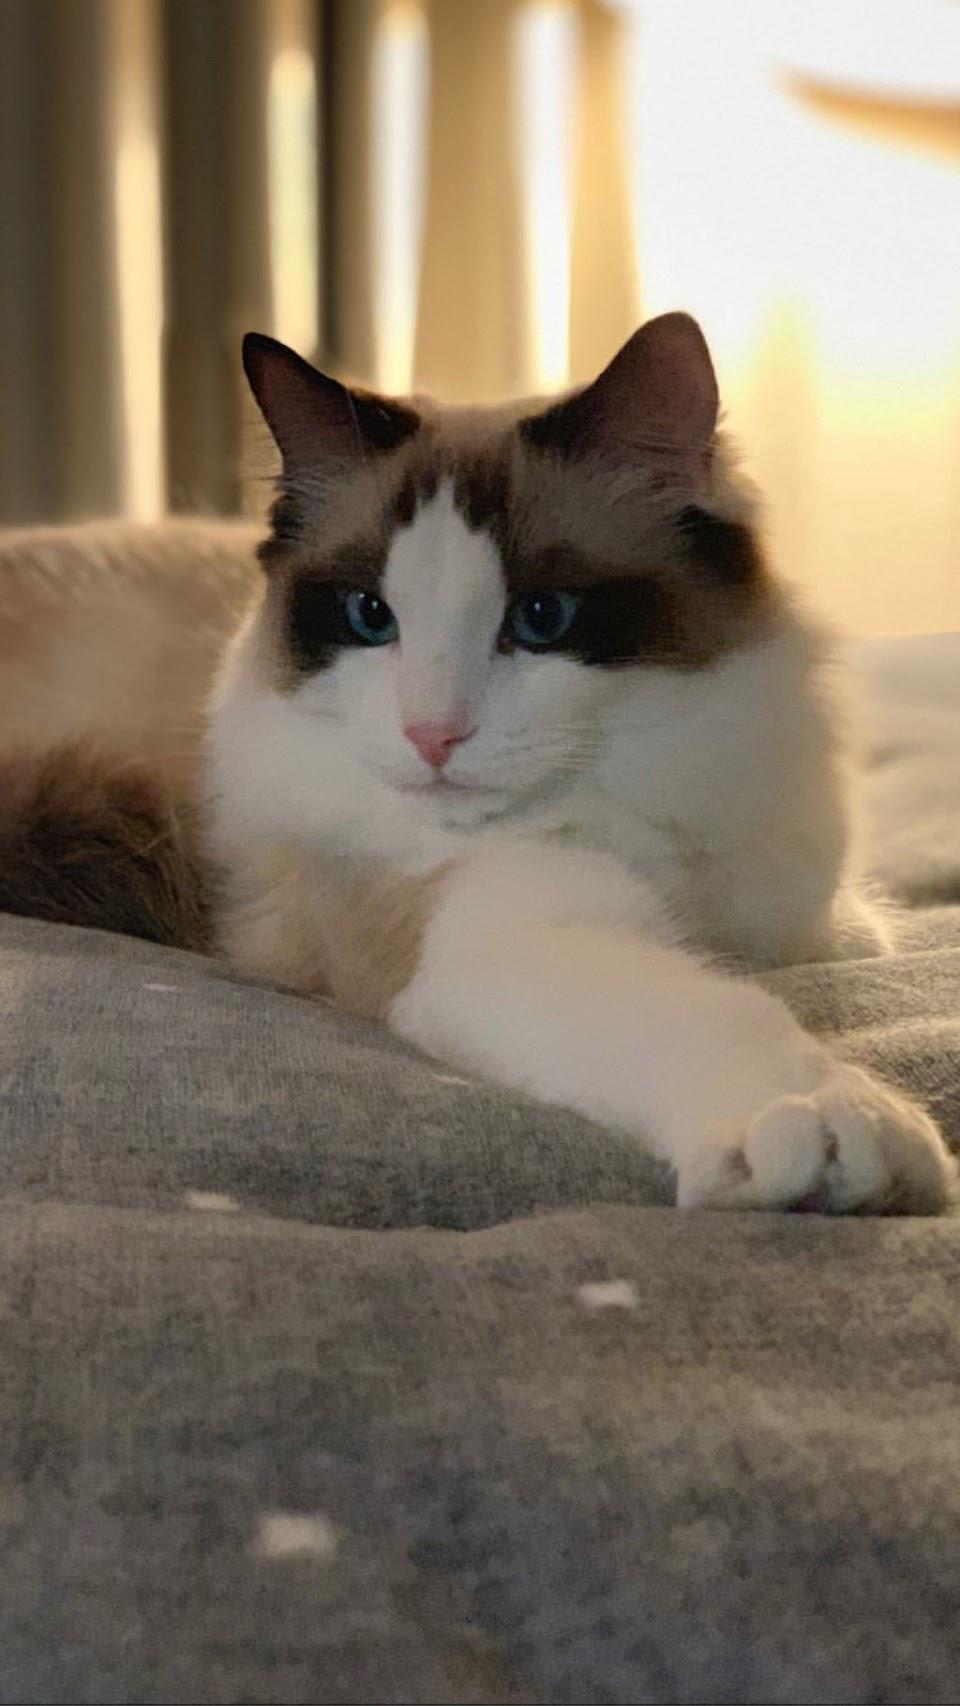 BLACKPINK-Lisa-Cat-Luca-udpate-26-Feb-2019